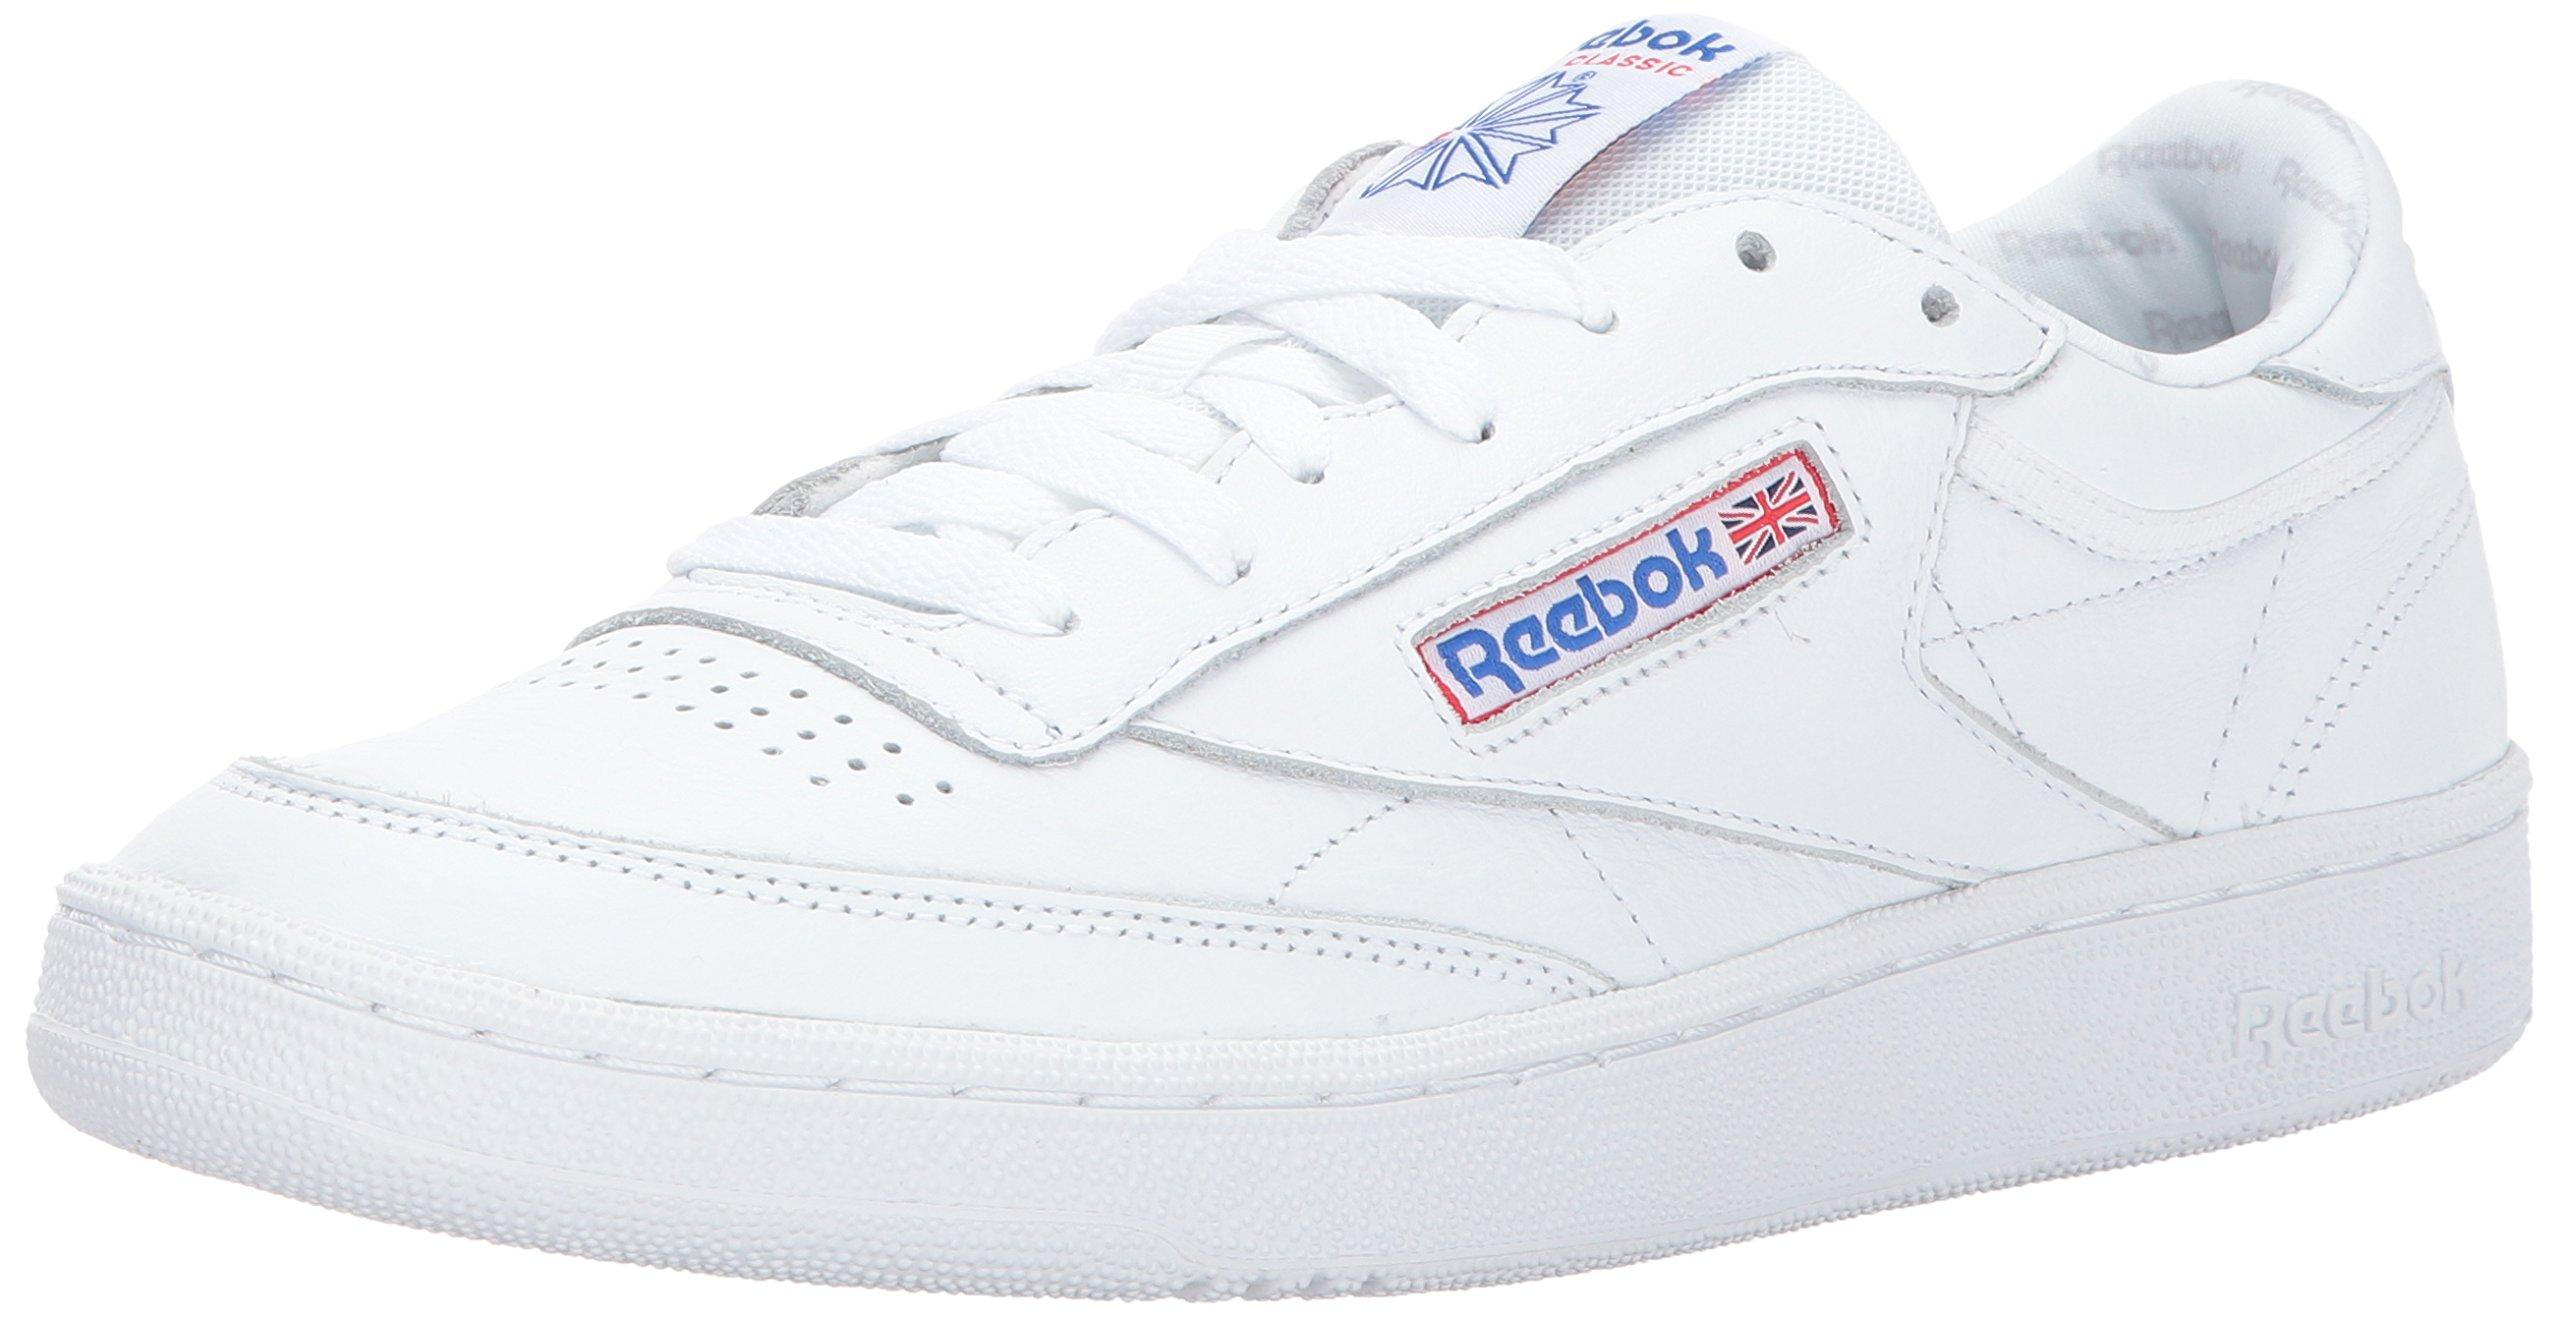 Galleon - Reebok Men s Club C 85 SO Fashion Sneaker 85eccb4c4